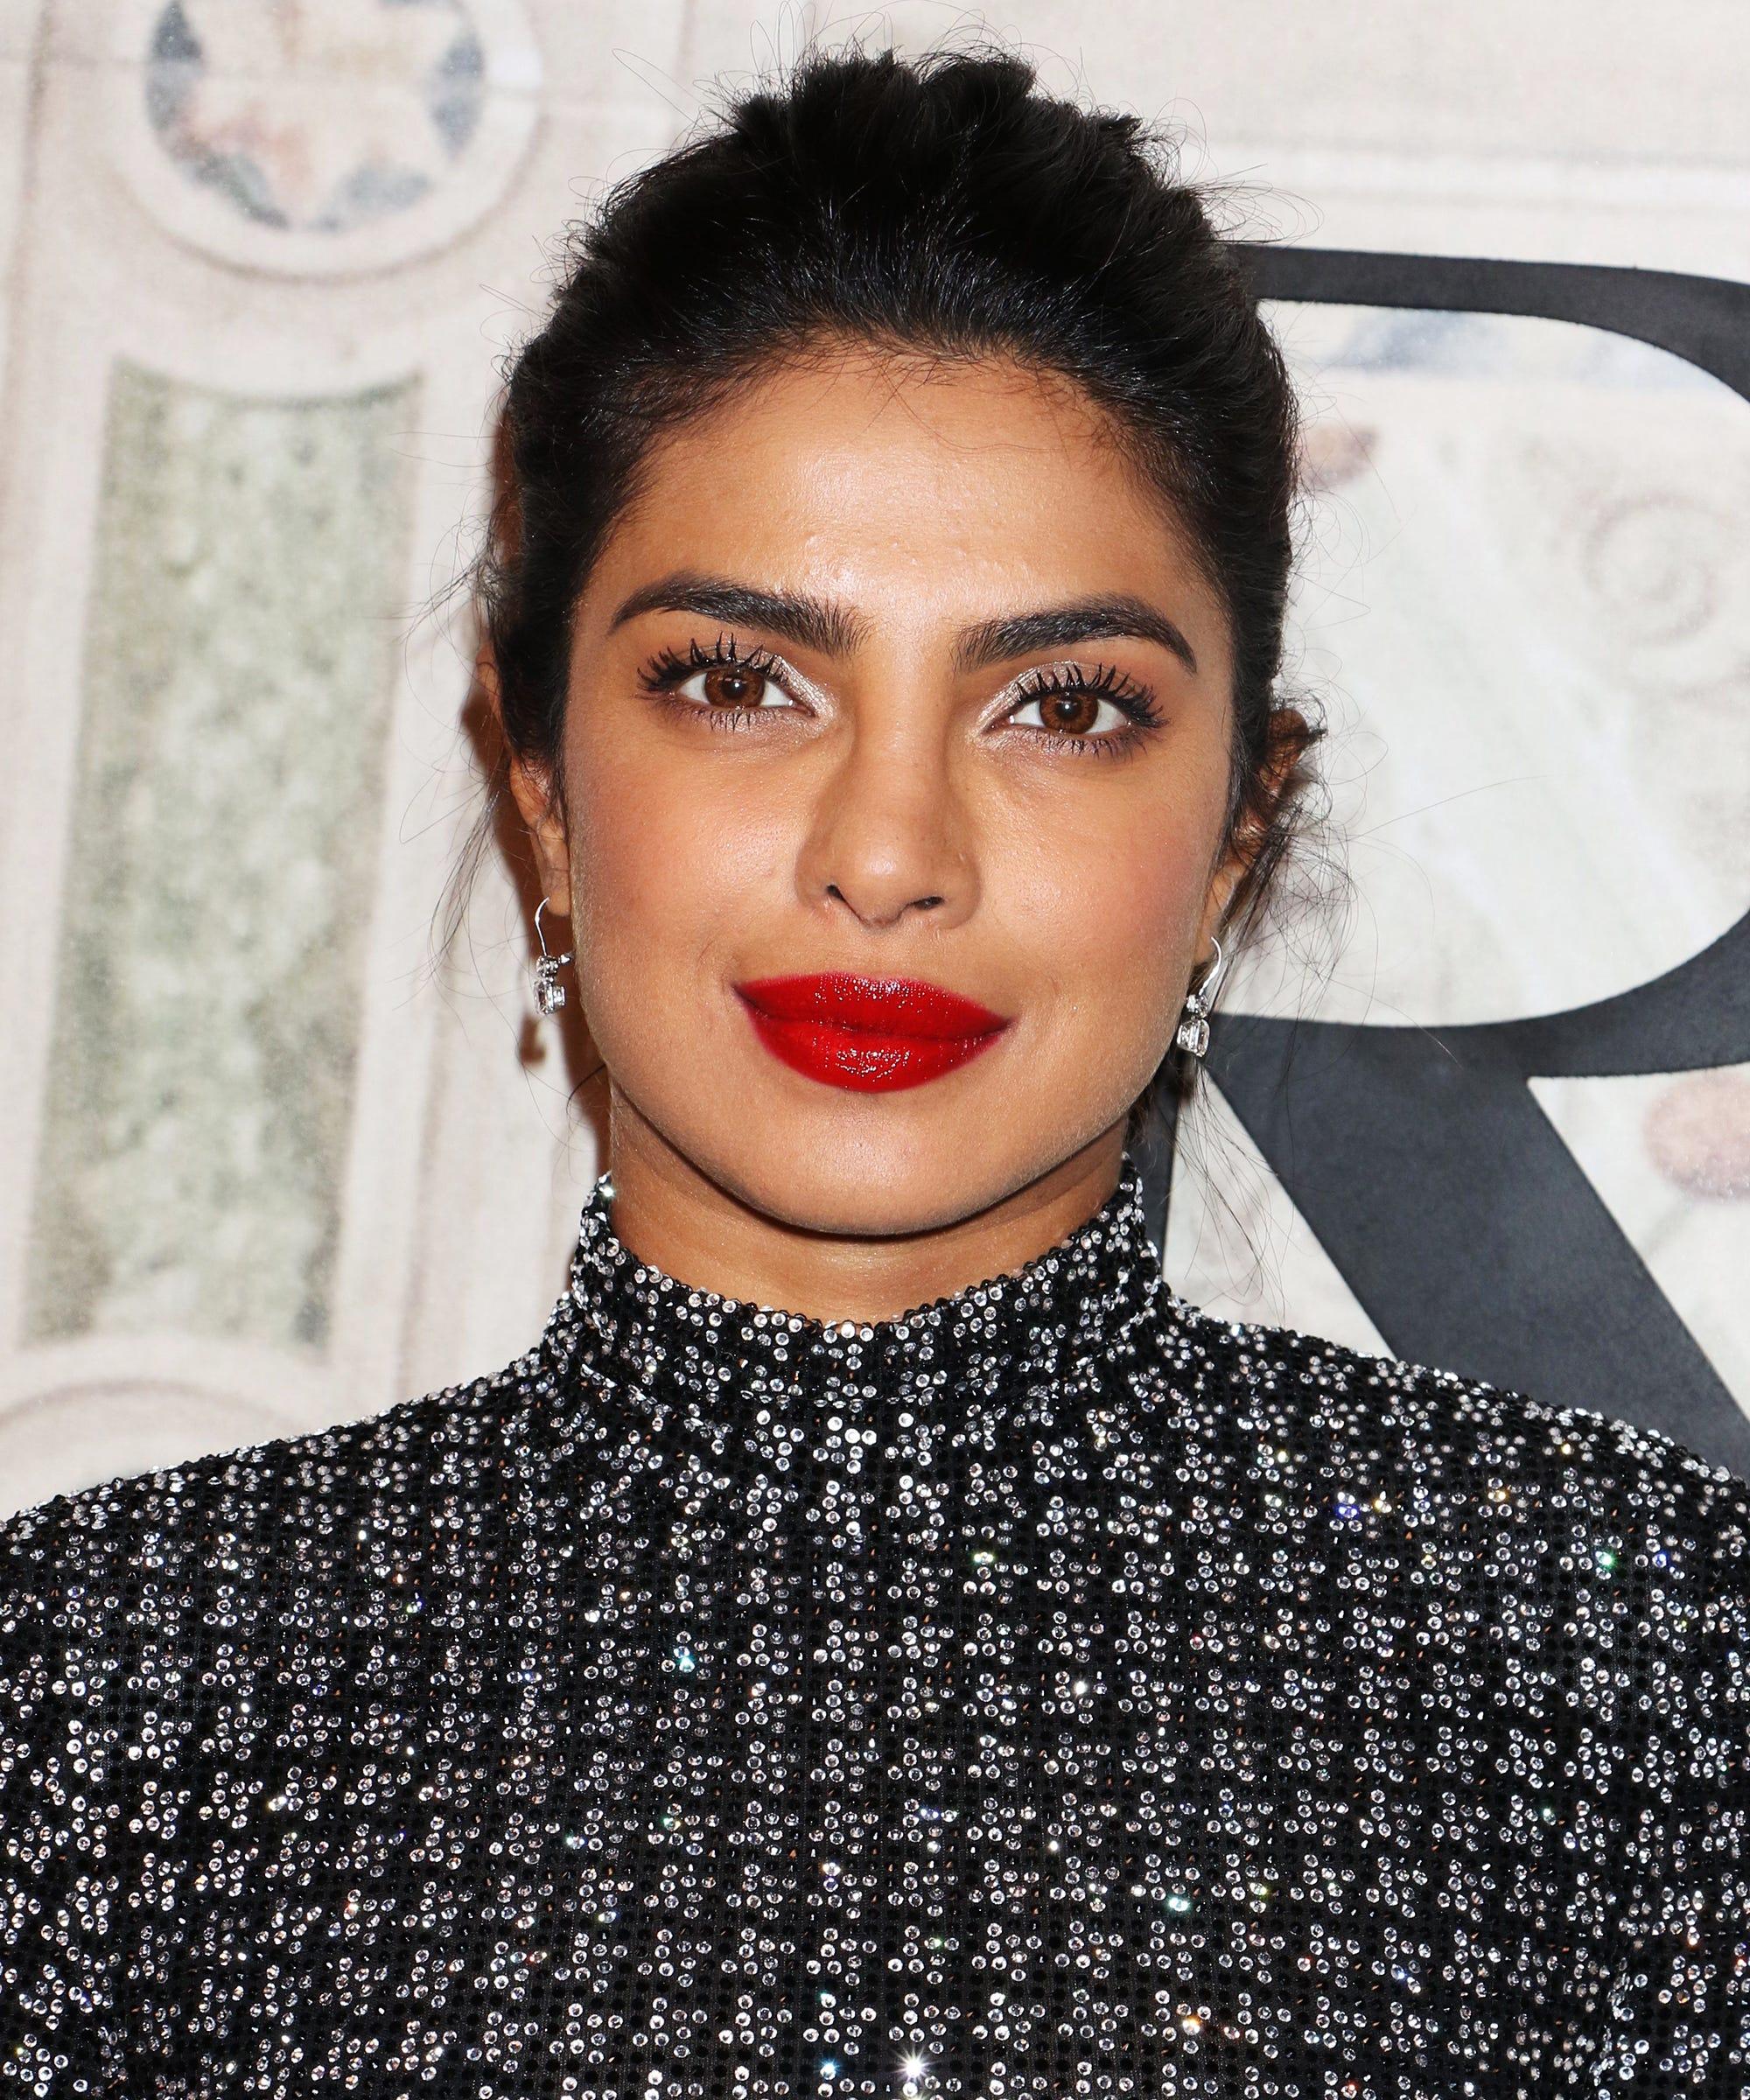 a7e59d0469e3 Priyanka Chopra s Makeup Artist Shares Her Bridal Beauty Tips